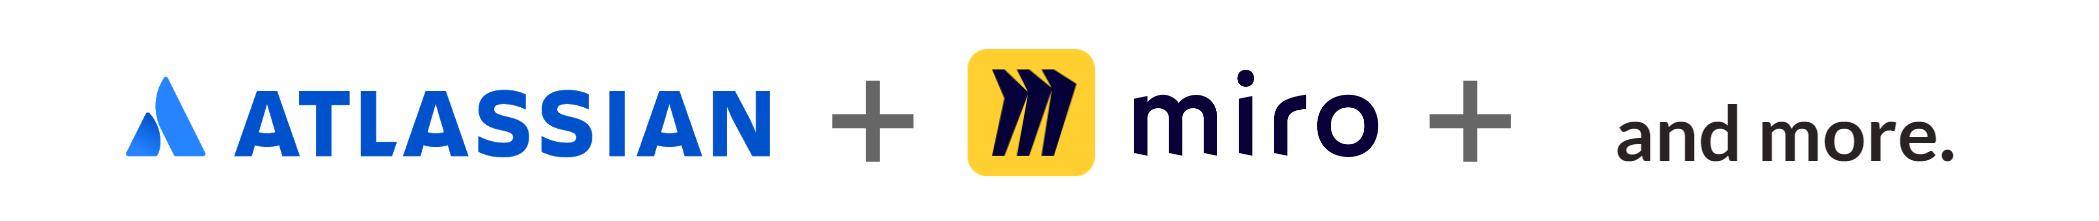 Atlassian+miro+and_more.